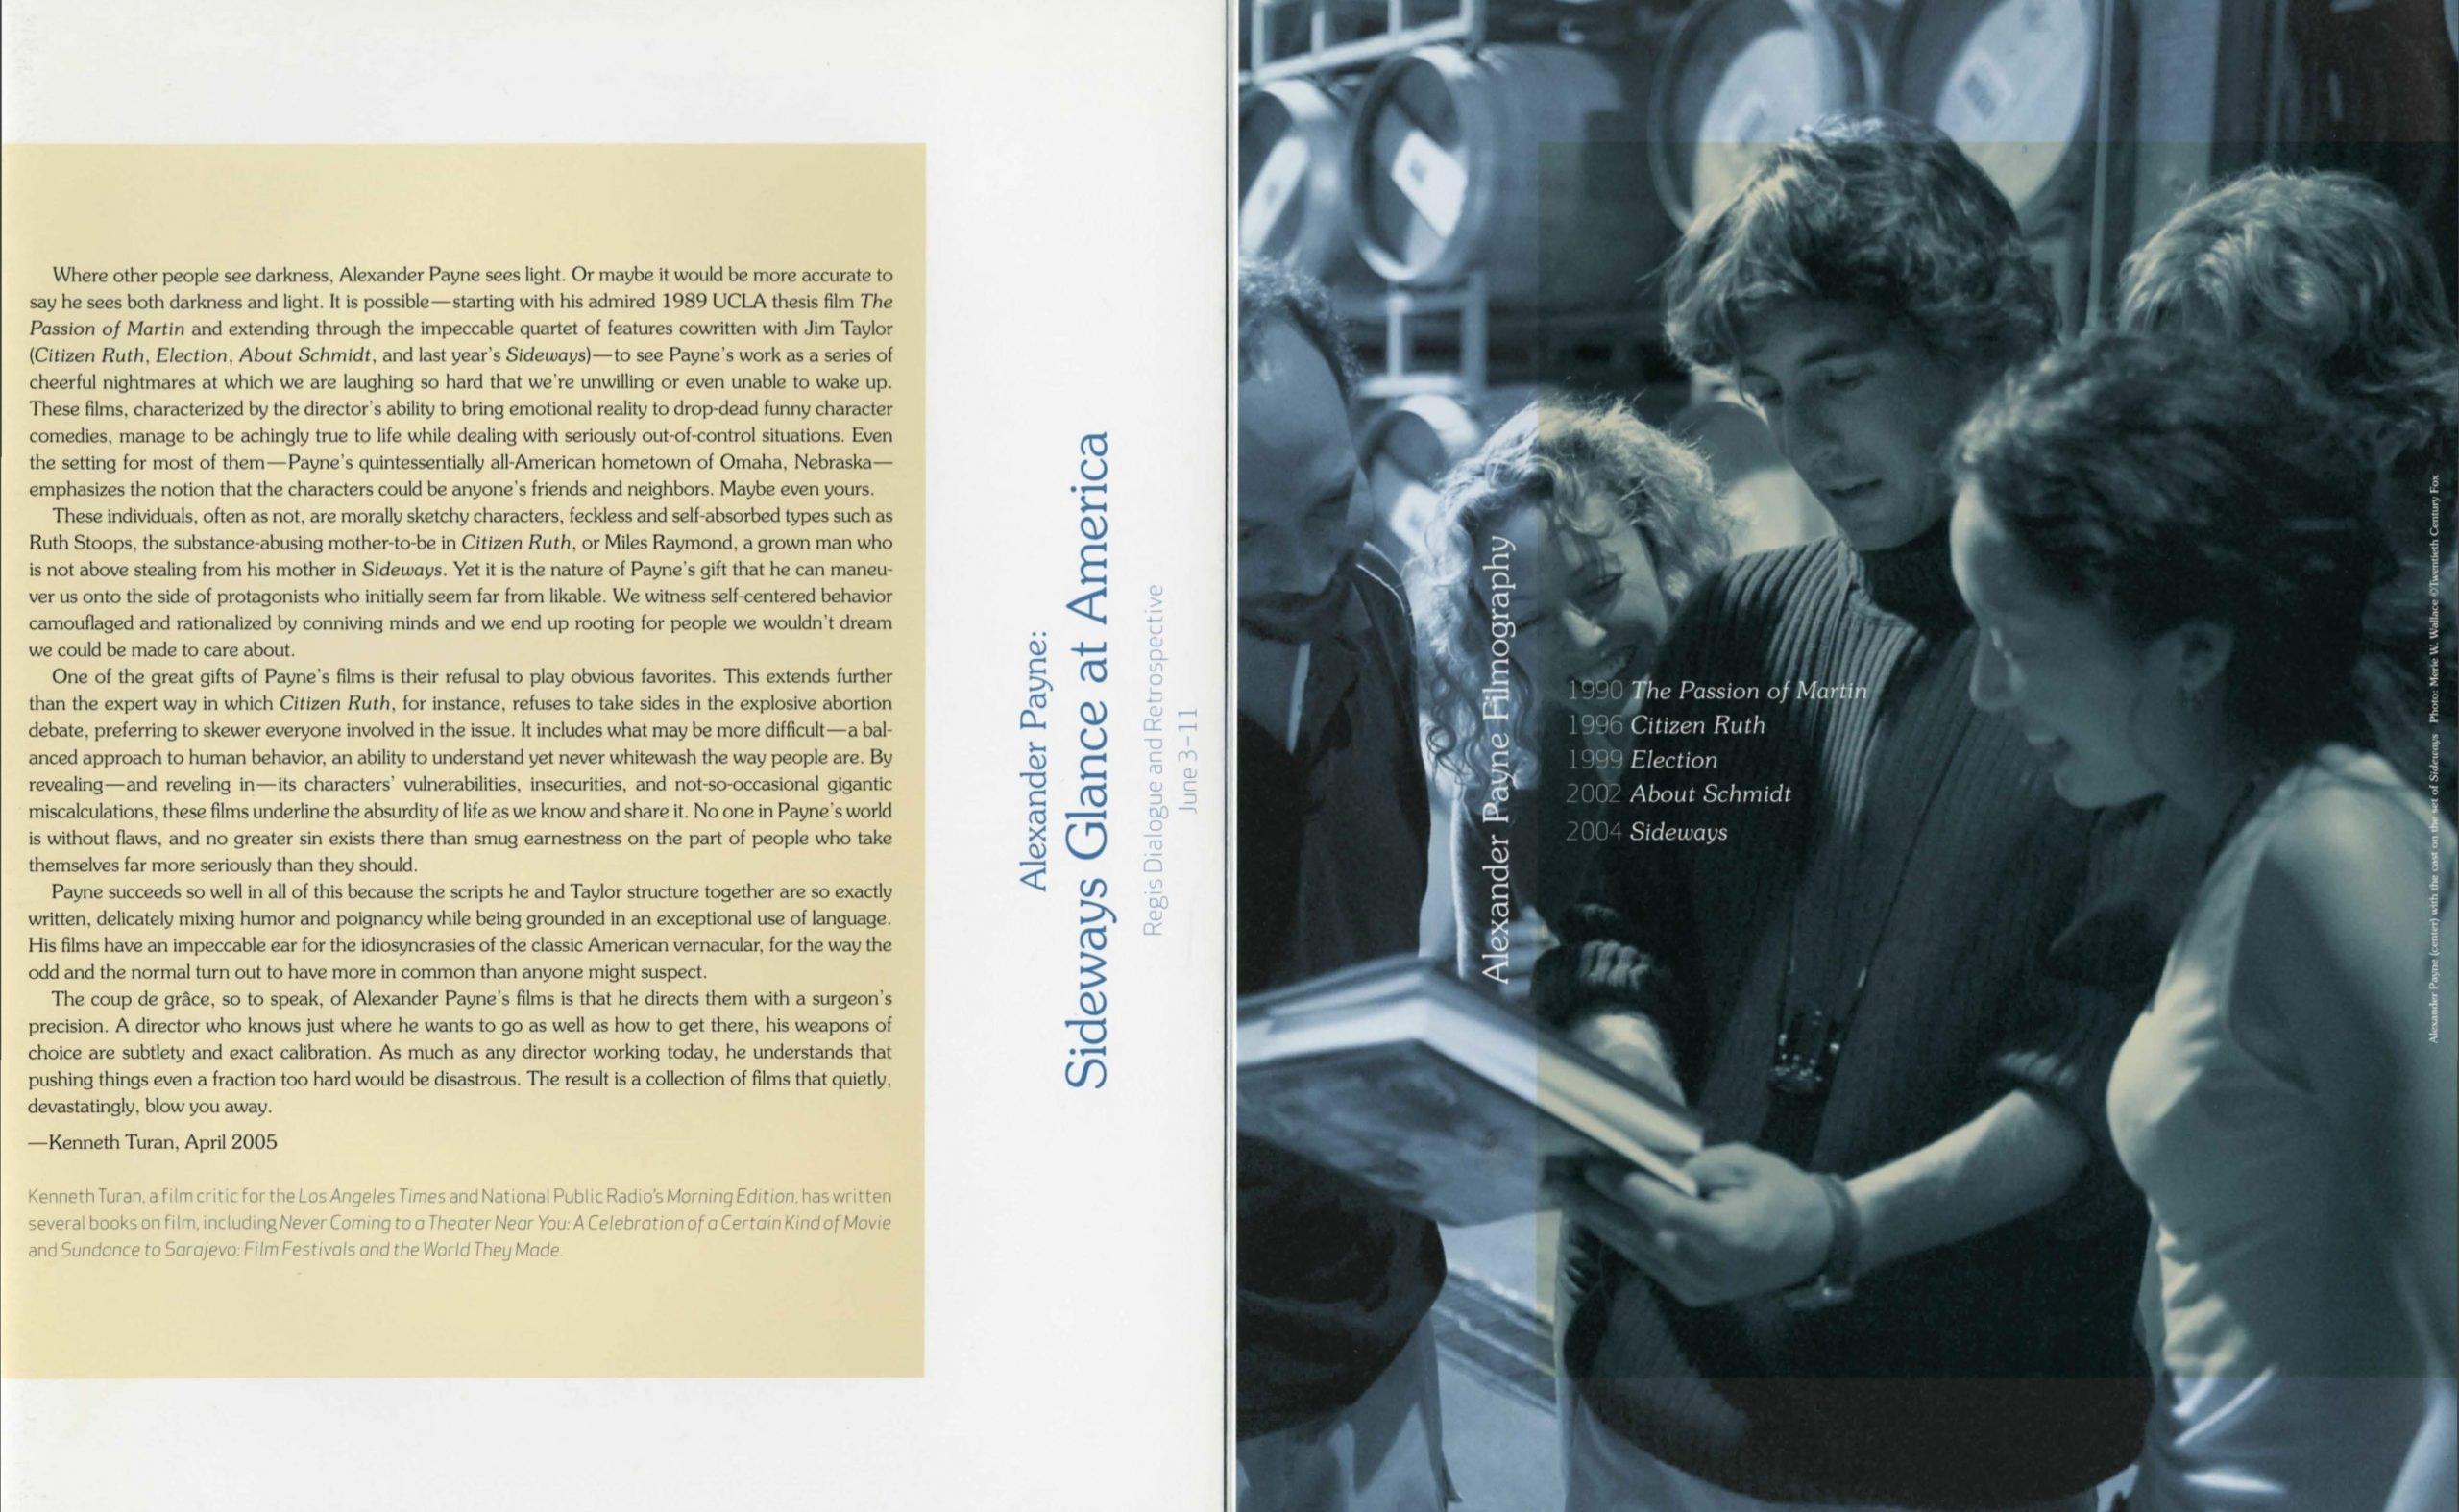 Alexander Payne Dialogue event brochure page 2